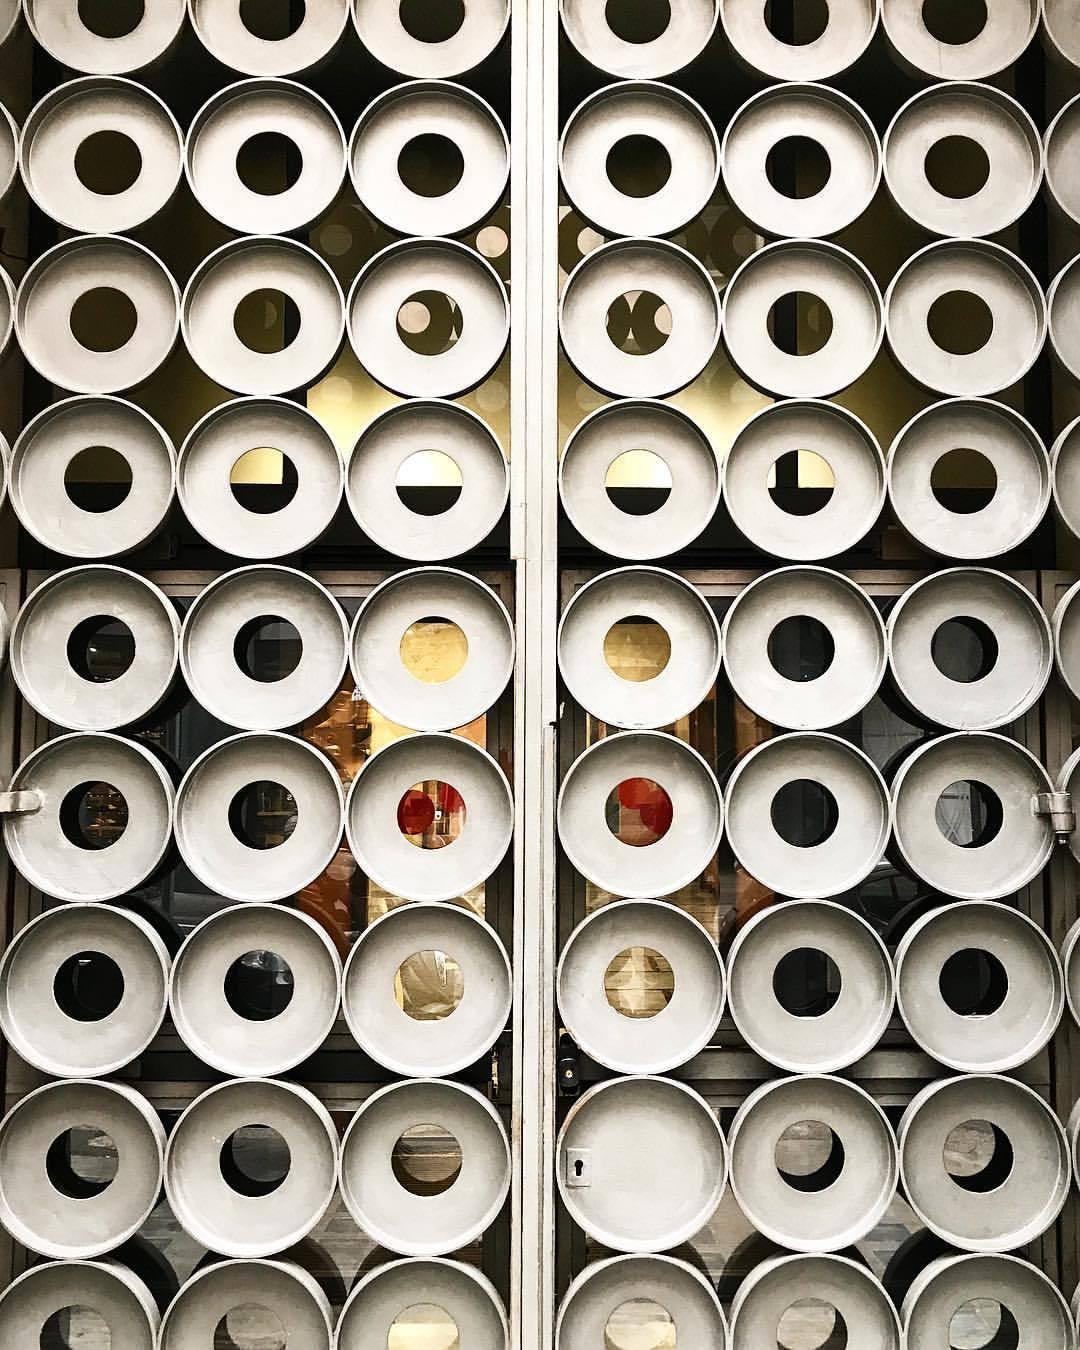 Door.  -  #italy #design #artineverydaylife  (at Milan, Italy)